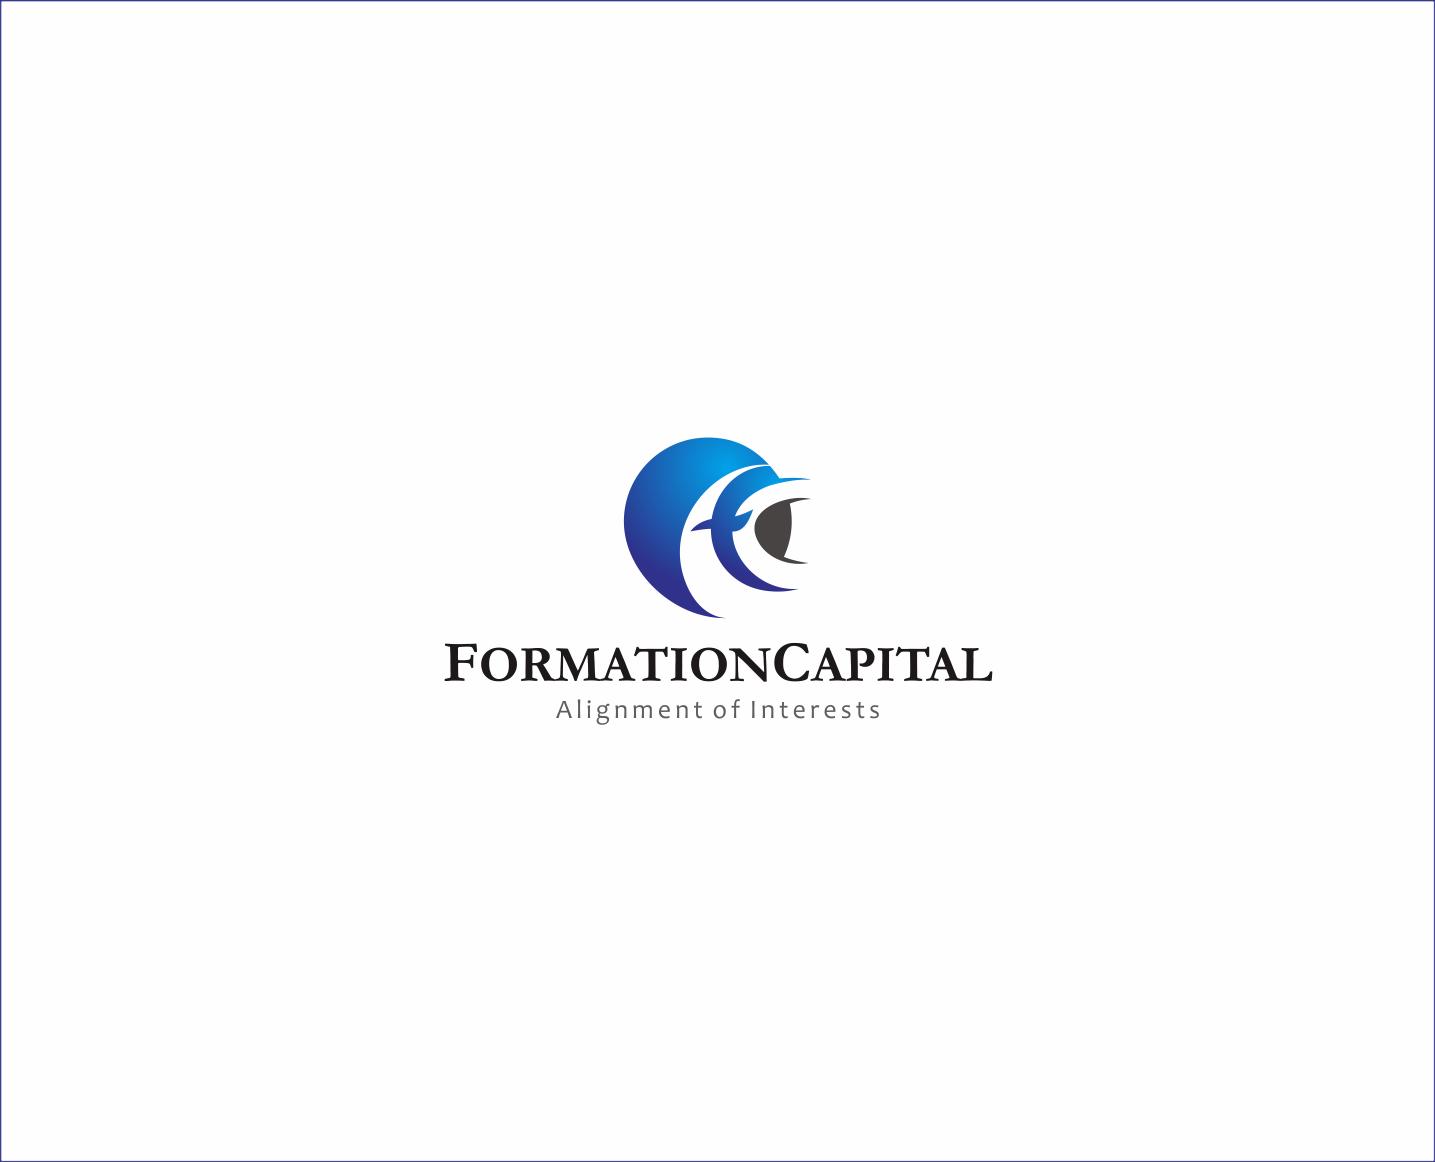 Logo Design by Armada Jamaluddin - Entry No. 195 in the Logo Design Contest Inspiring Logo Design for Formation Capital.